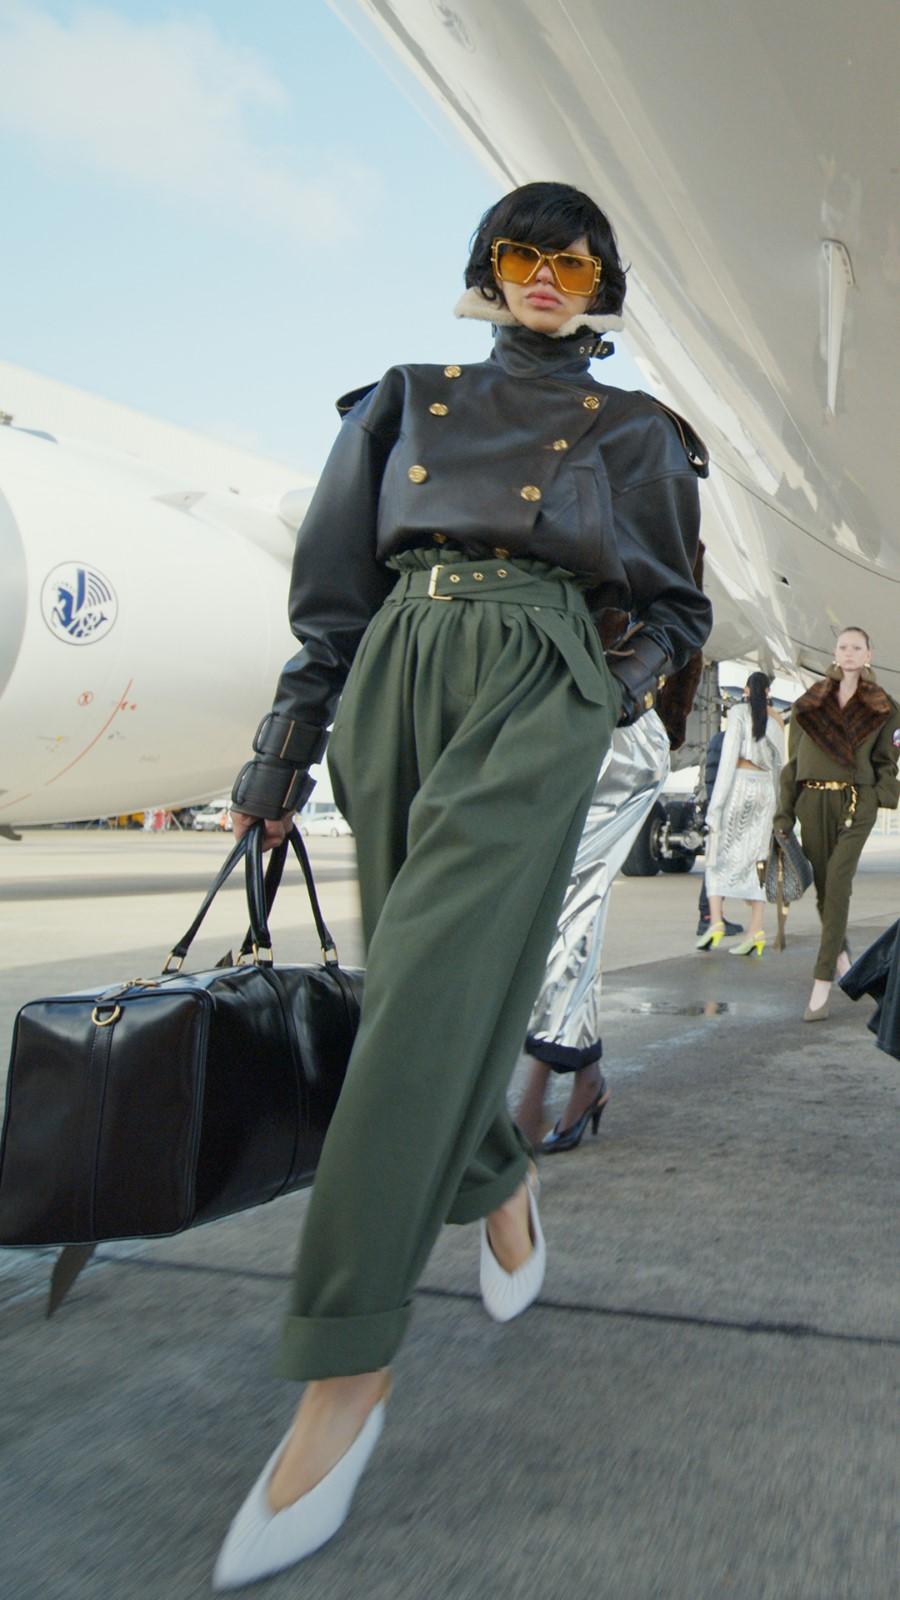 Balmain Fall Winter 2021 - Paris Fashion WeekBalmain Fall Winter 2021 - Paris Fashion Week